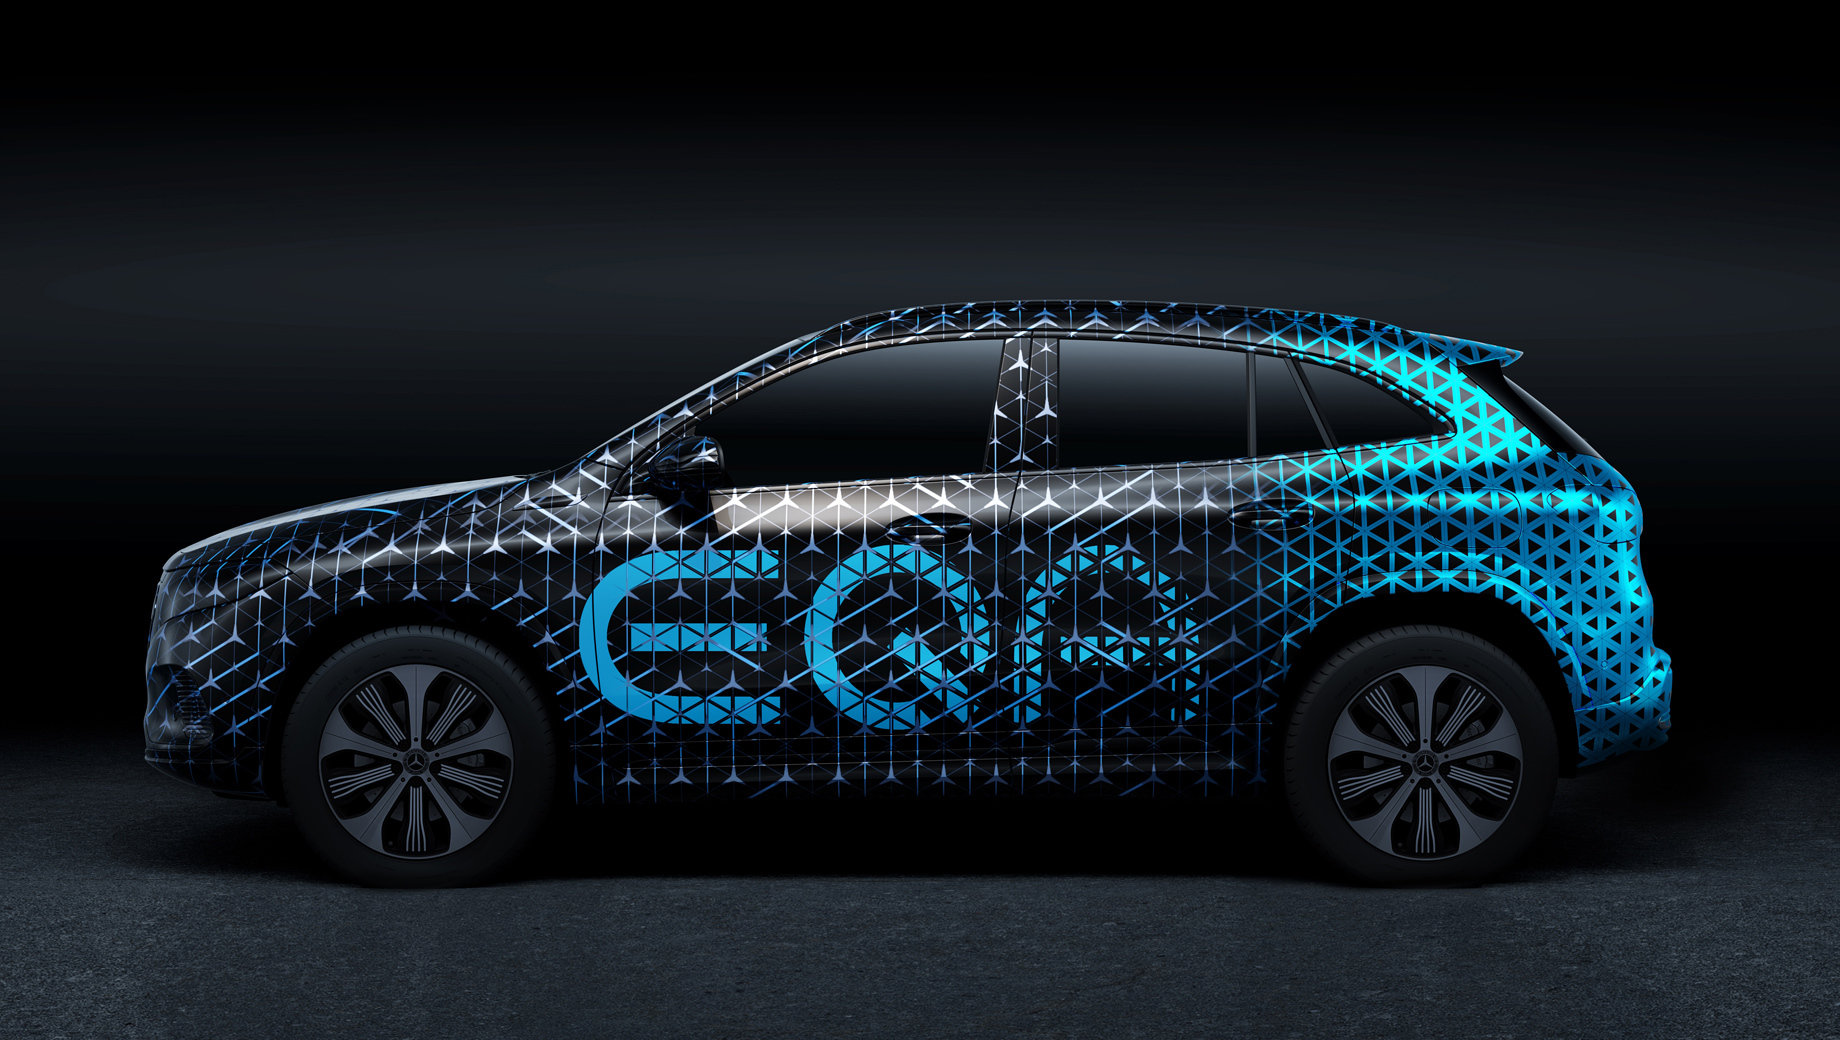 Премьера модели Mercedes-Benz EQA отложена на полгода